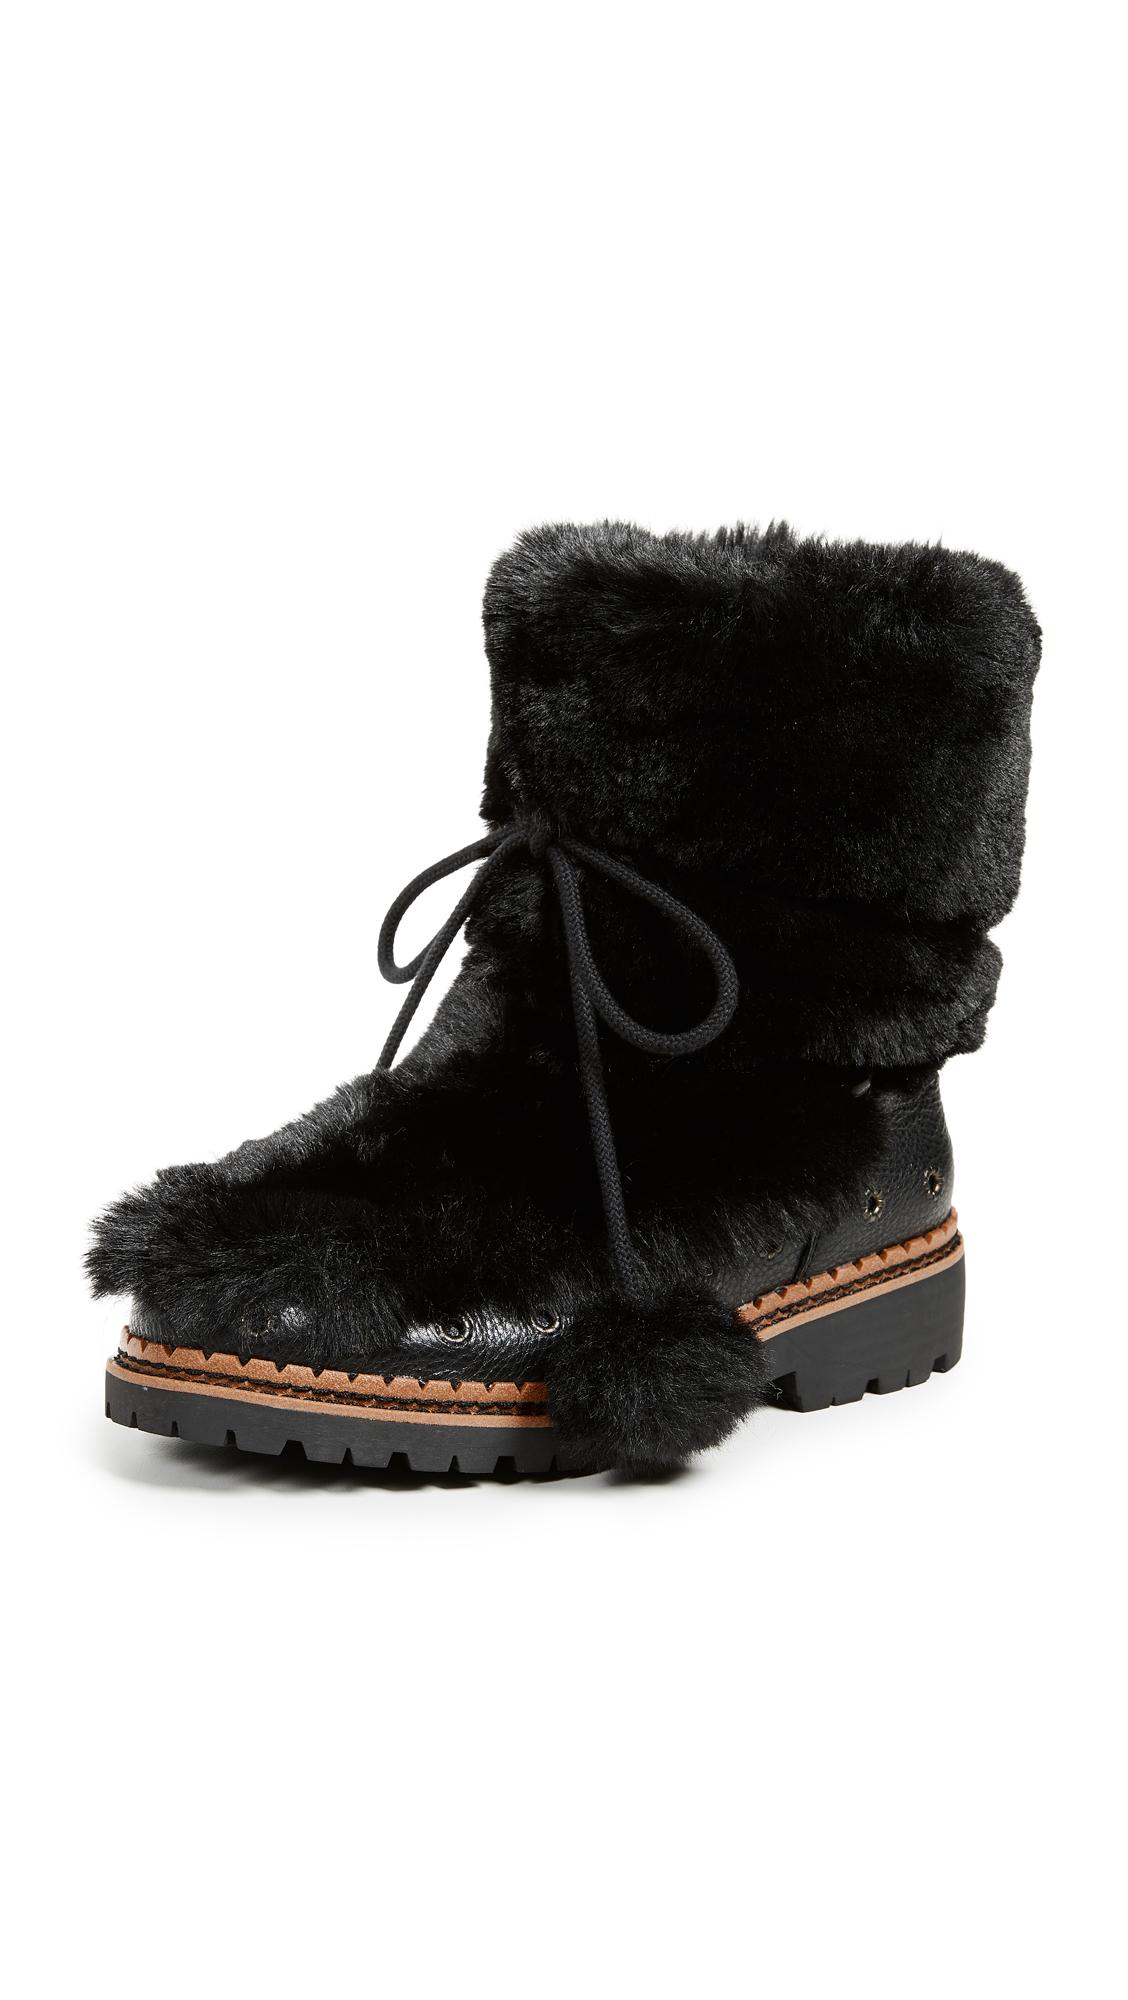 Sam Edelman Blanche Boots - Black